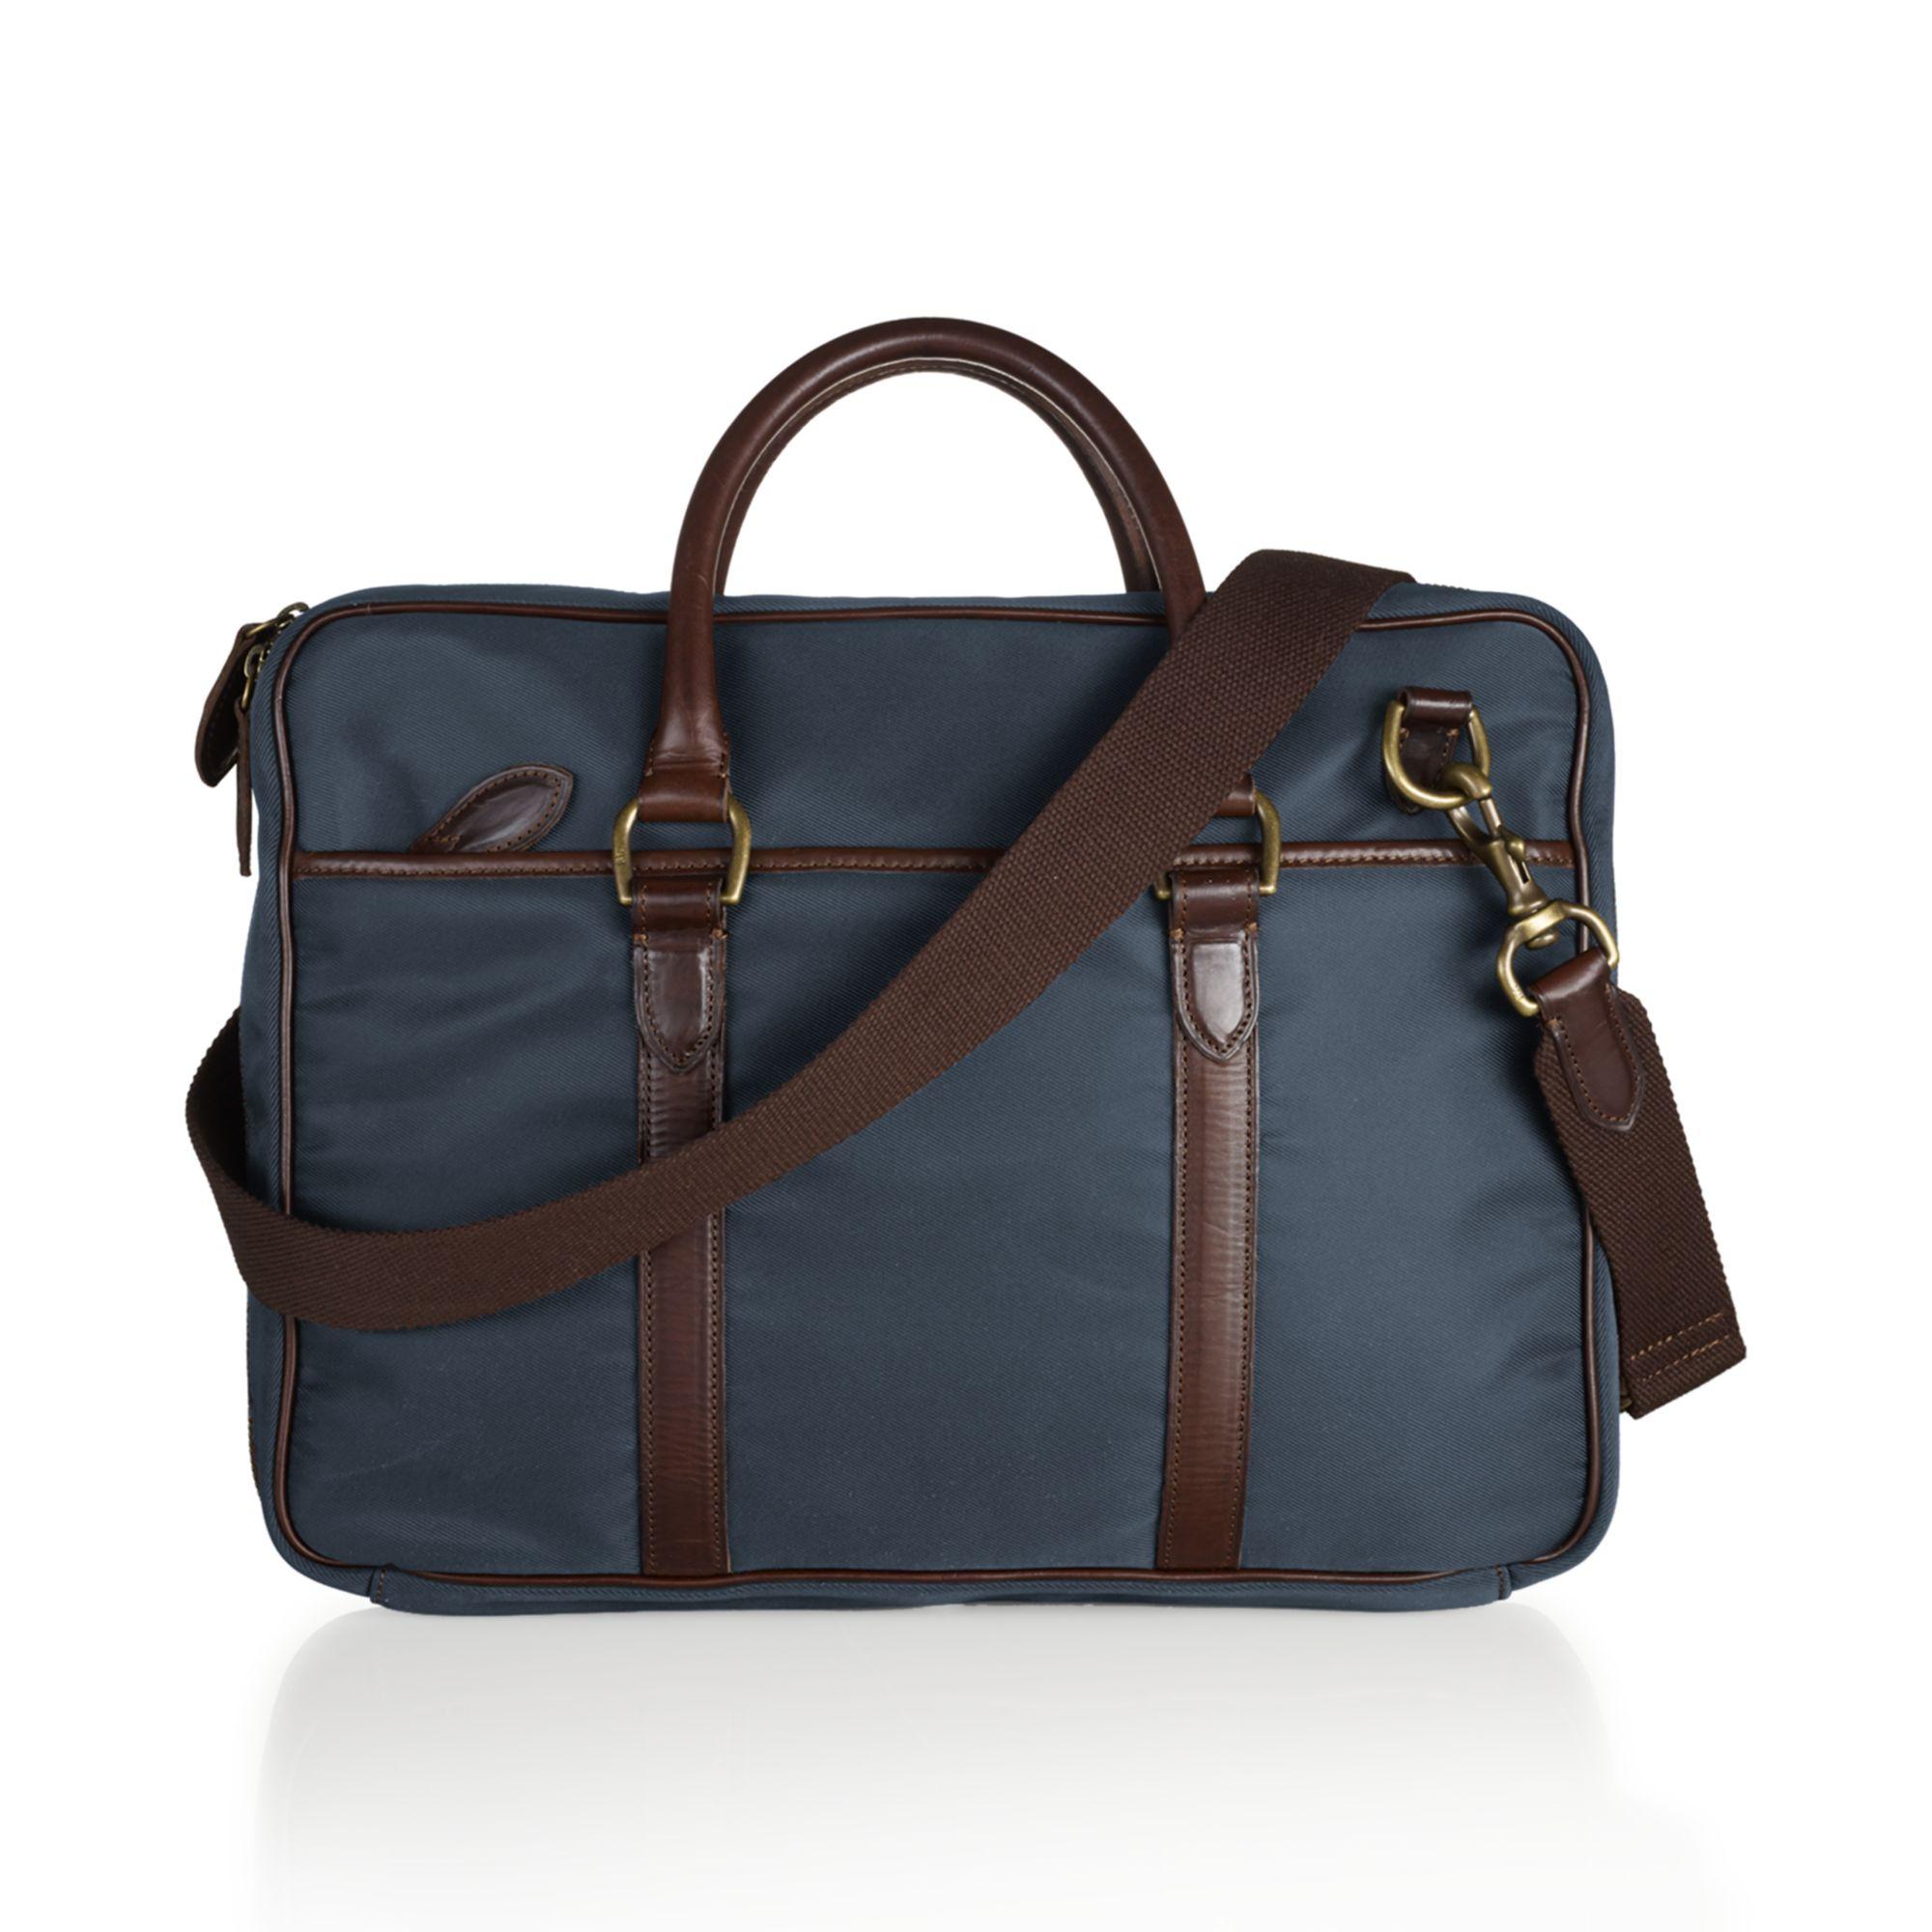 BFB Laptop Messenger Bag - Designer Business Computer Bag or Briefcase for Men - Ideal Commuter Bag for Work and Travel - Black by My Best Friend is a Bag $ $ 72 50 Prime.